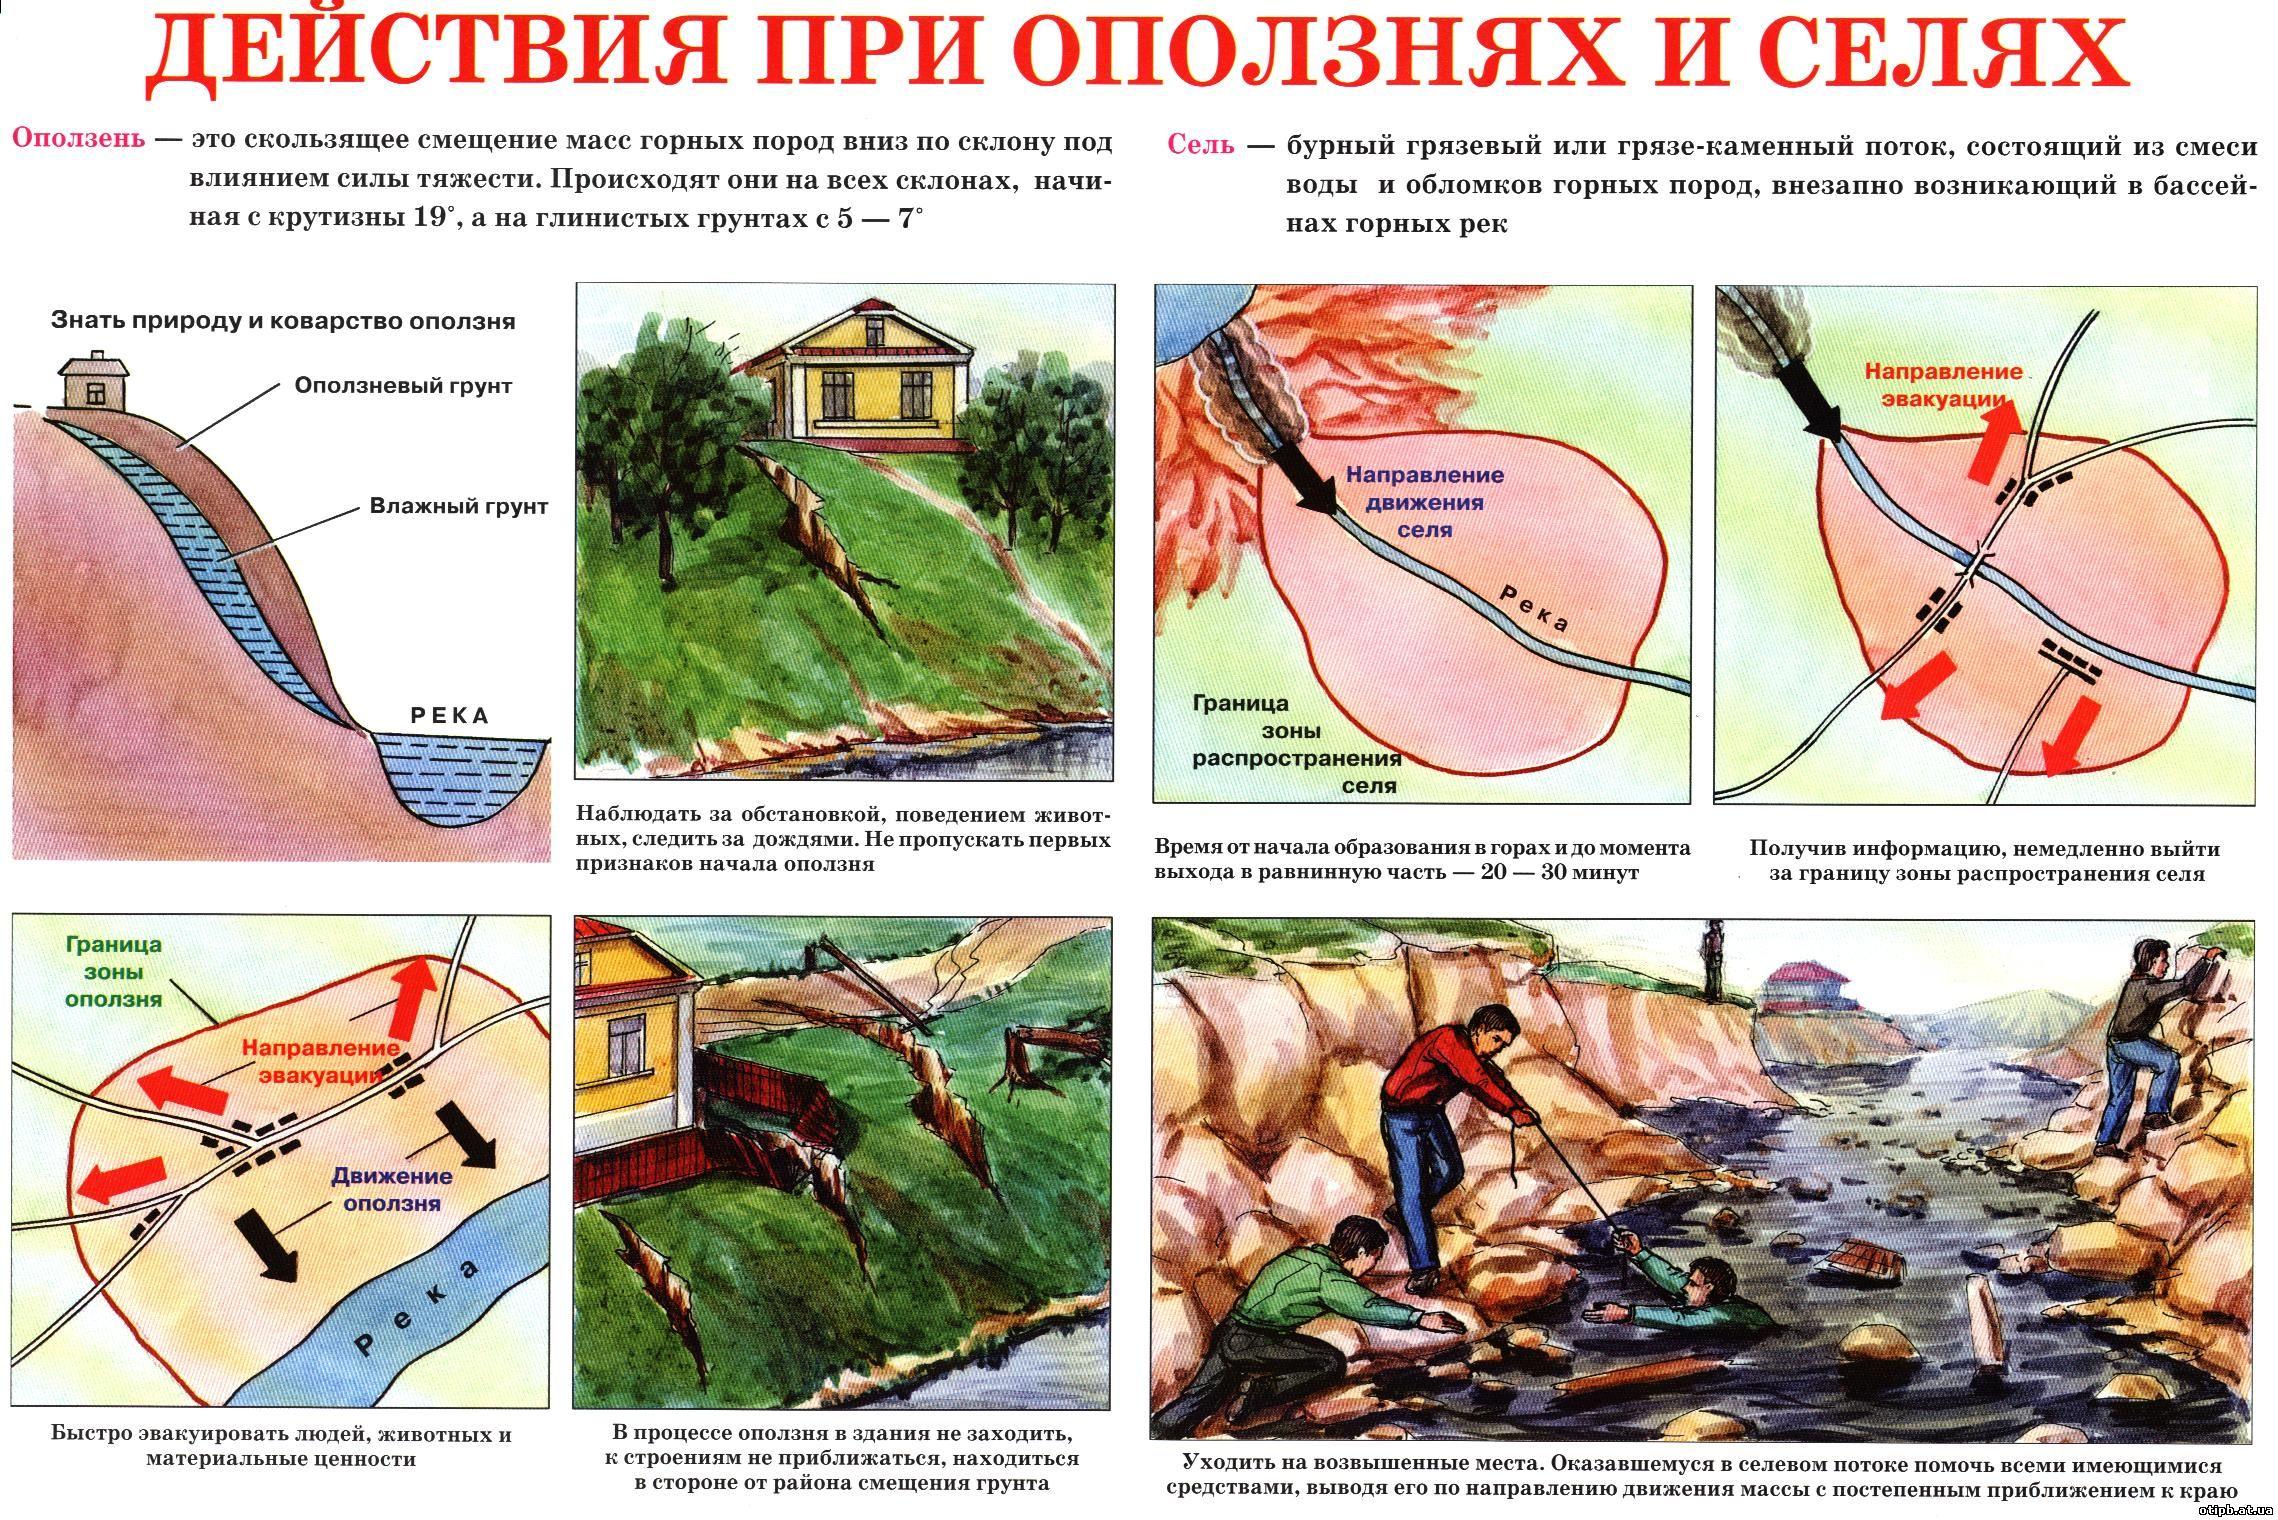 http://otipb.at.ua/106/1/opolzen.jpg